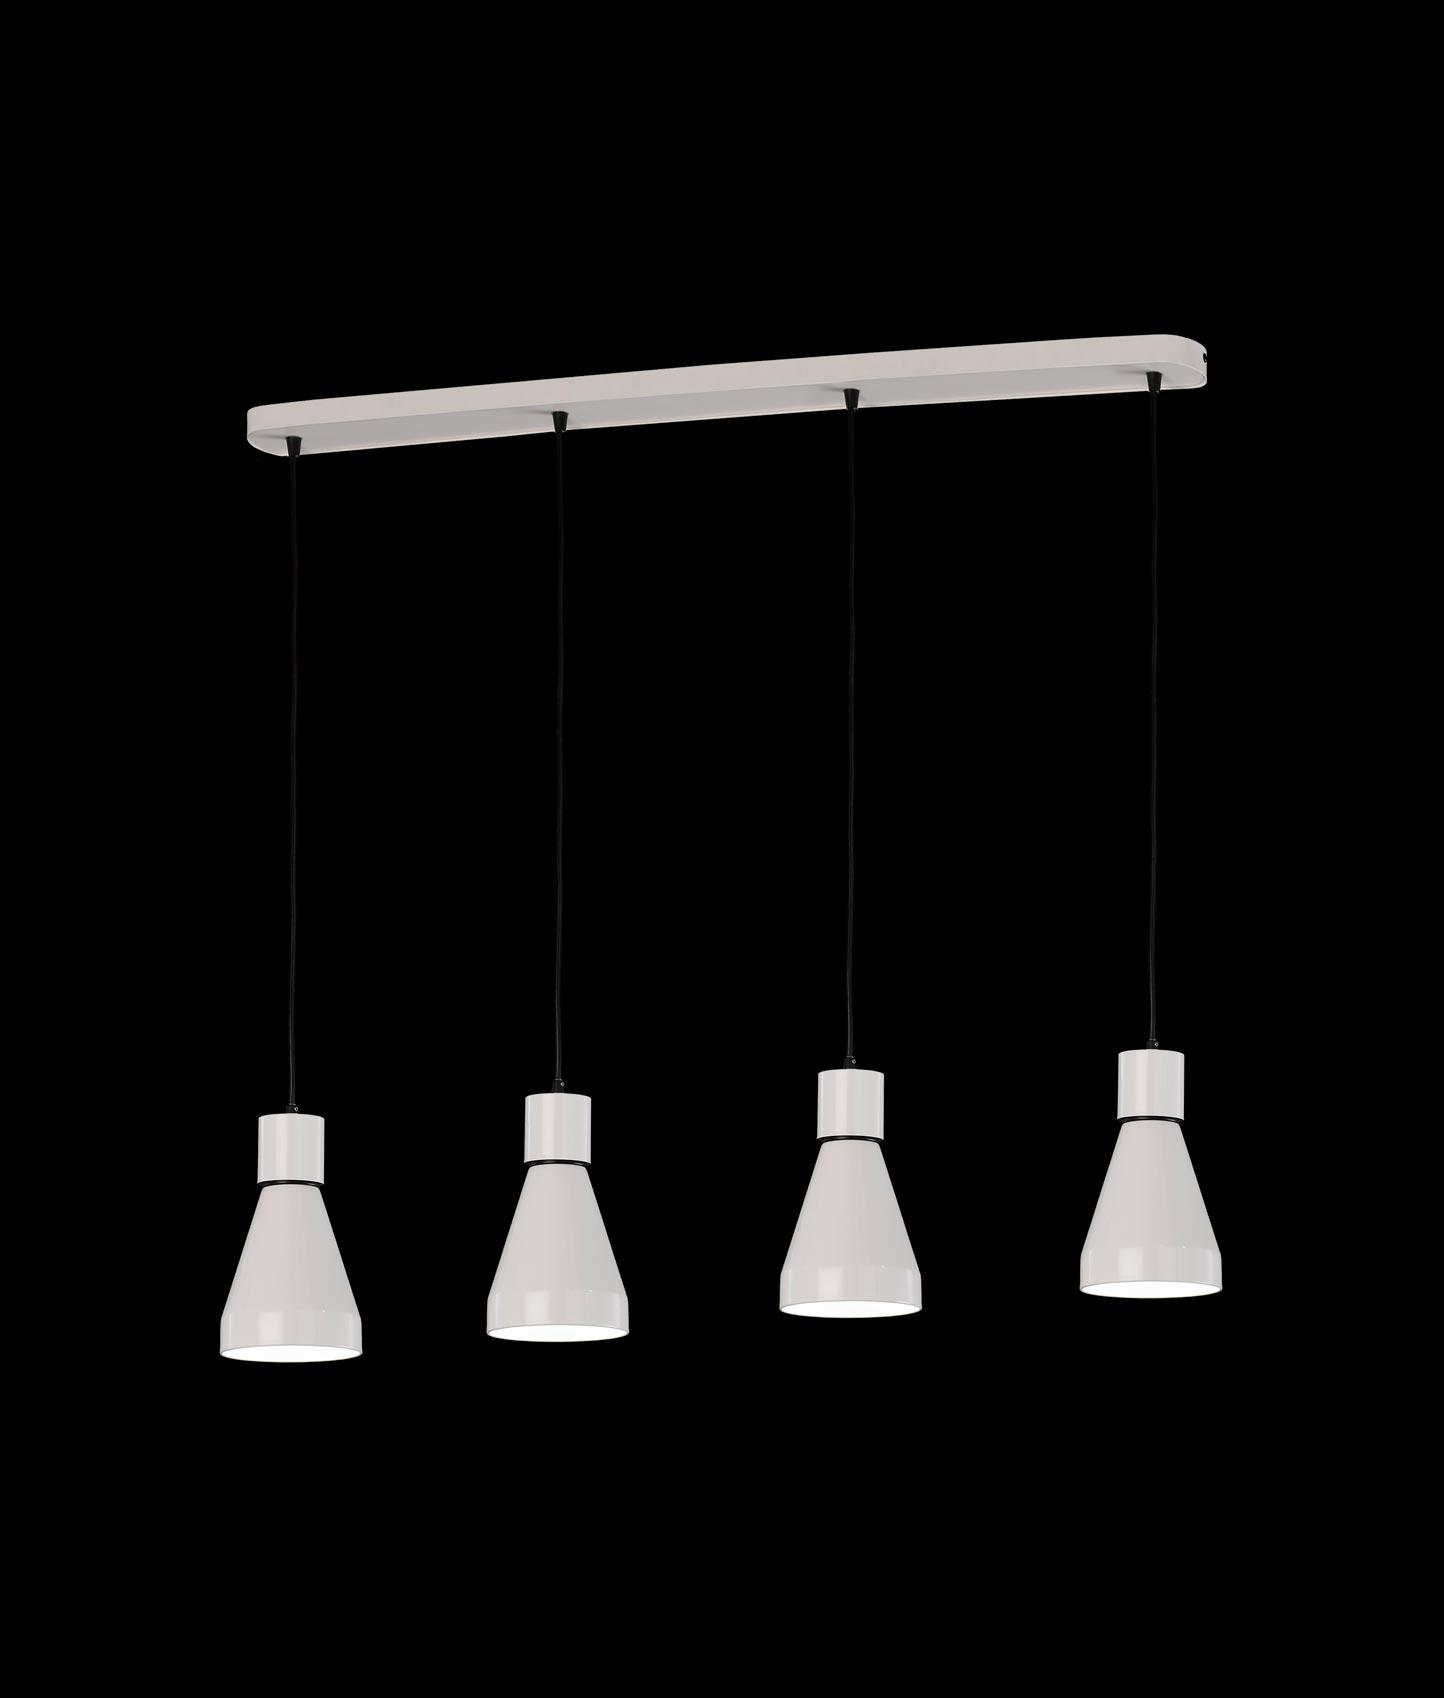 Luminaria lineal 4 luces KOS detalle